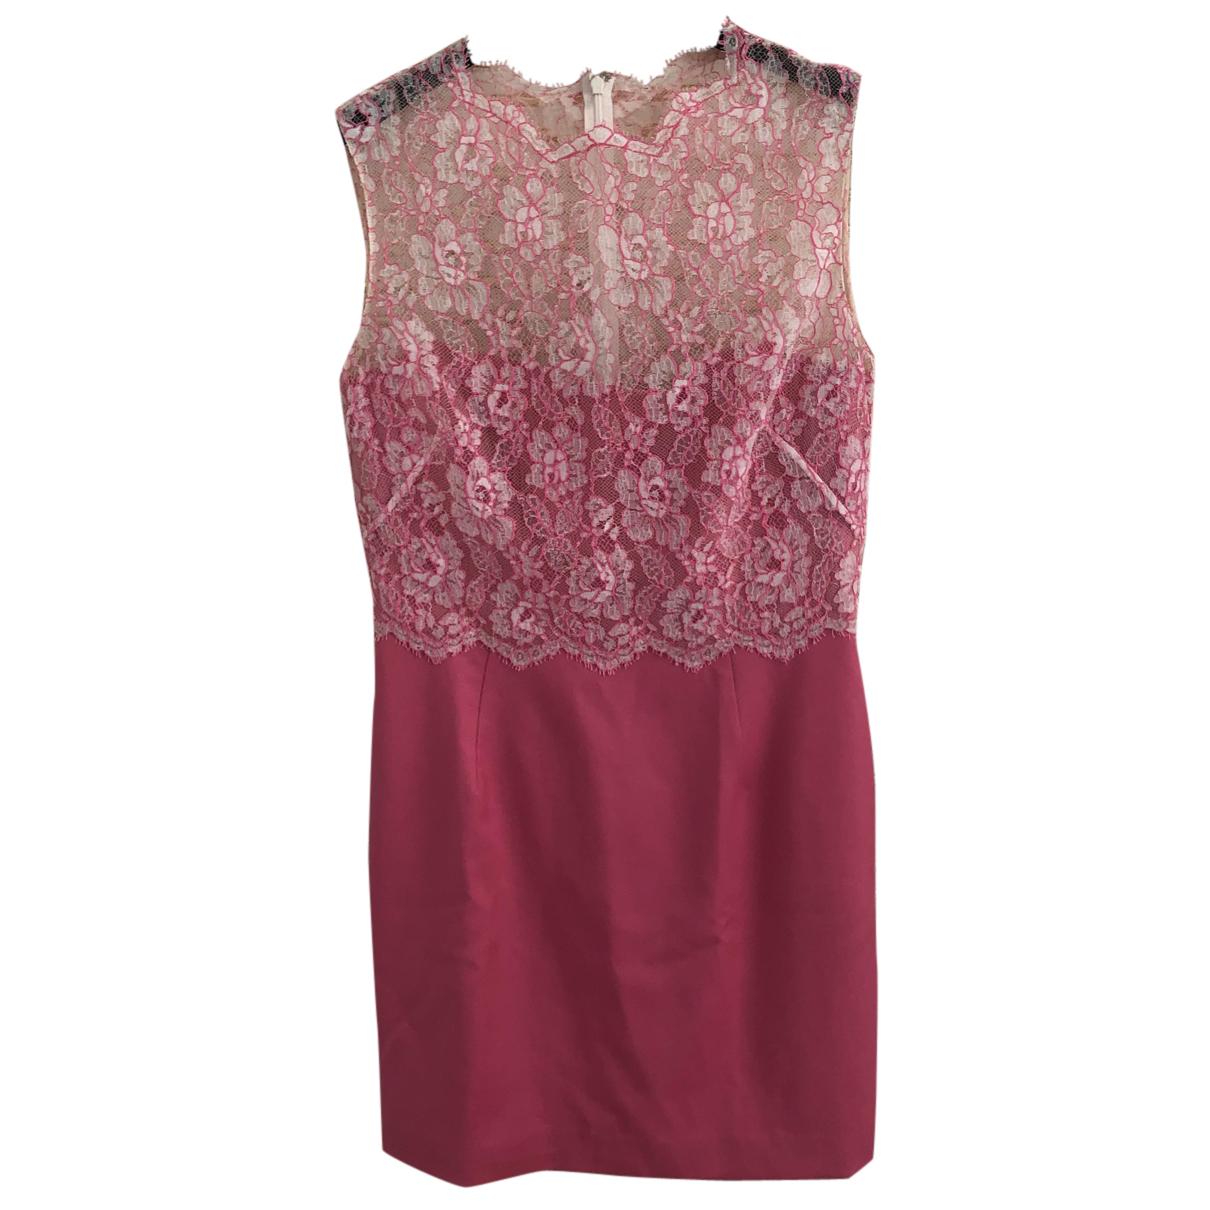 Valentino Garavani N Pink dress for Women 44 IT